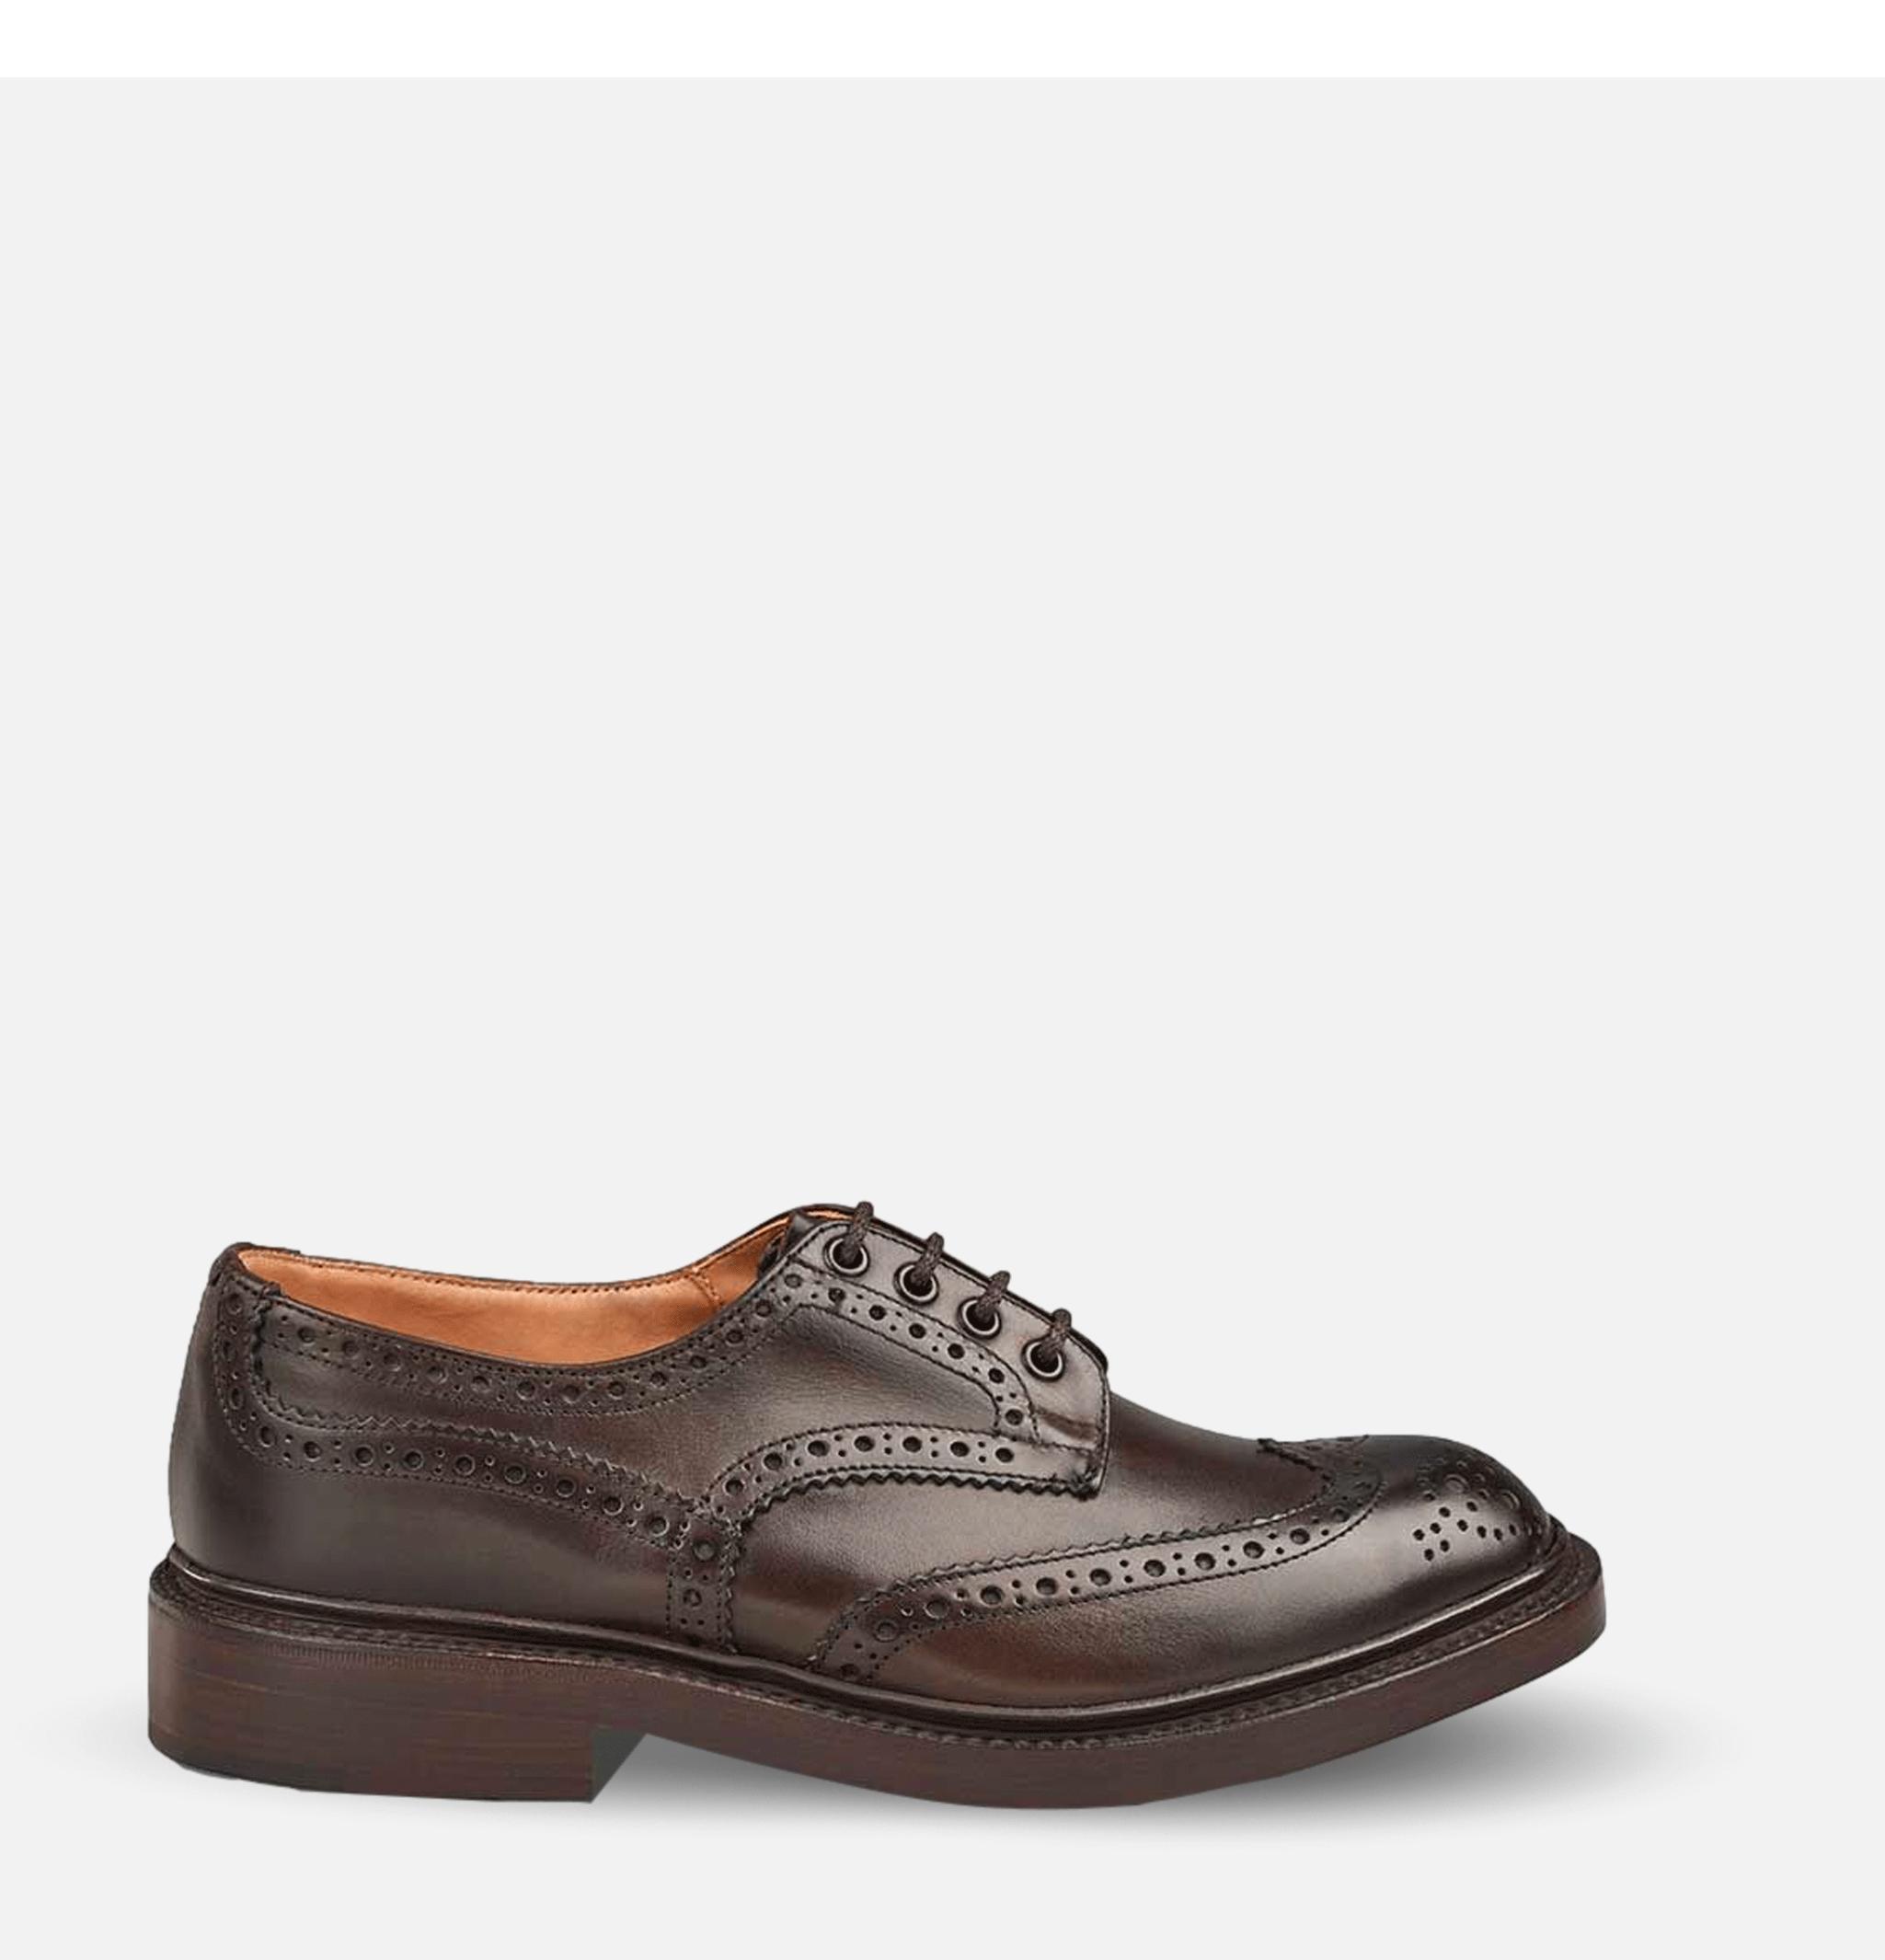 Shoes Bourton Espresso